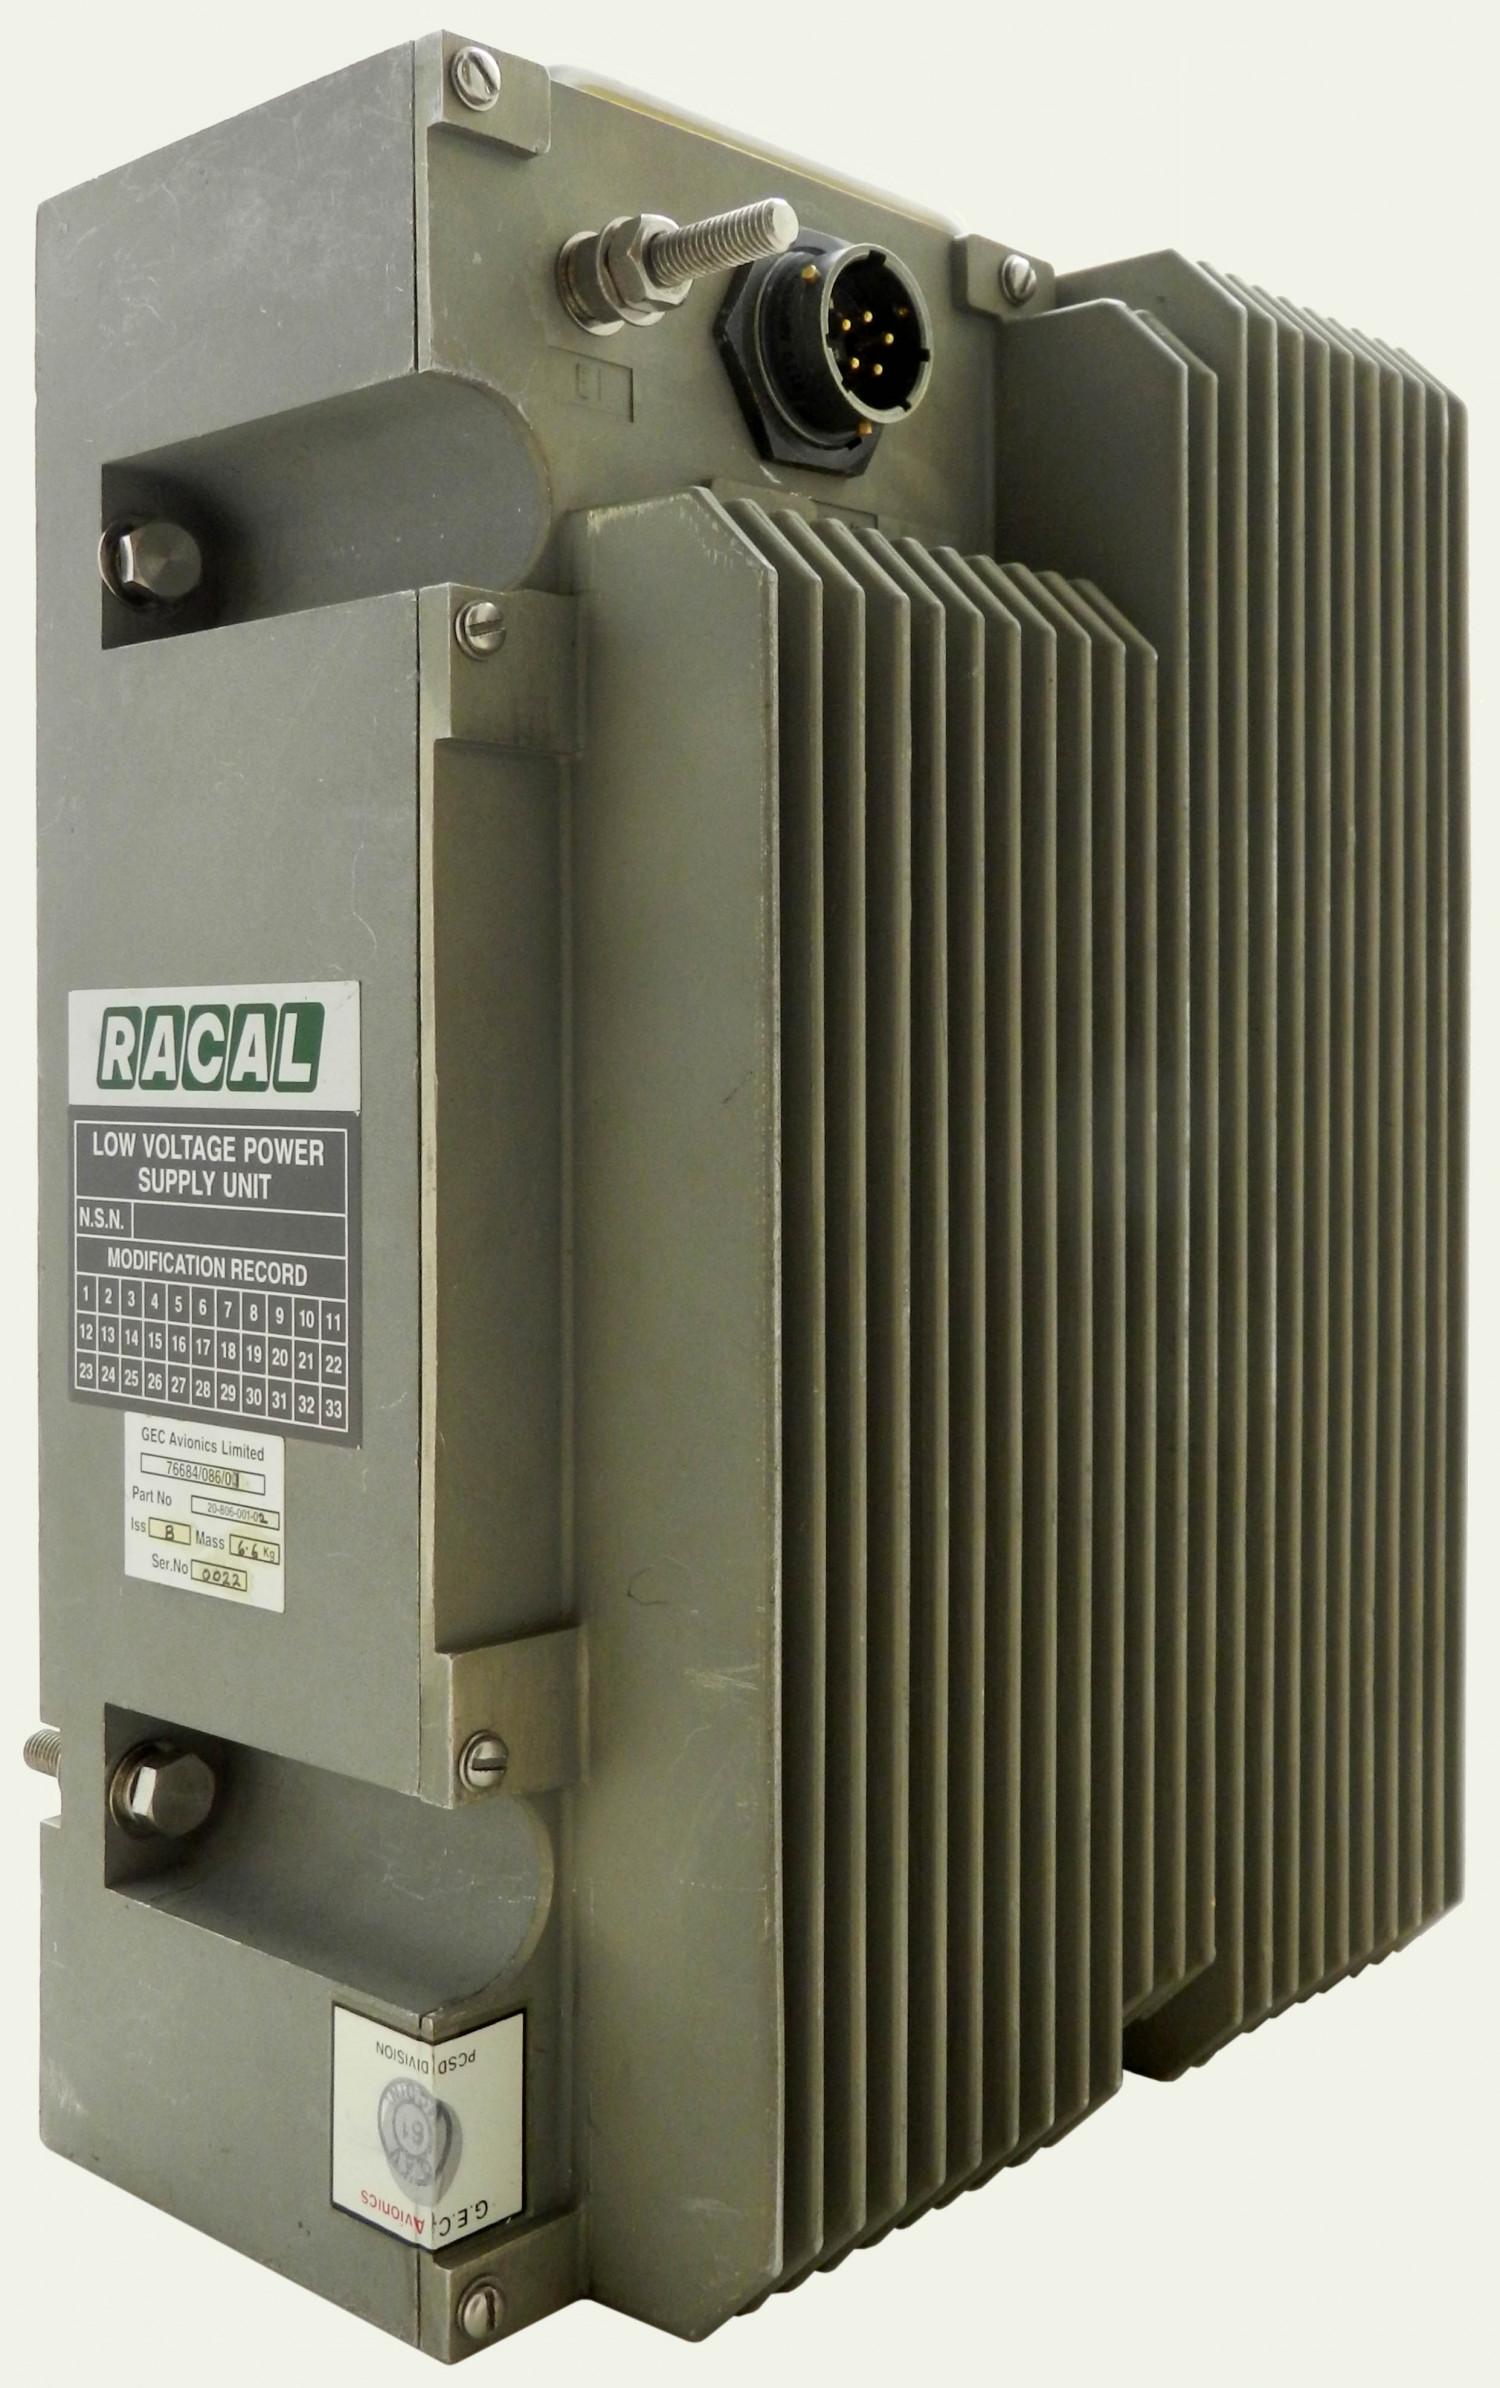 Low Voltage Power Supply Unit